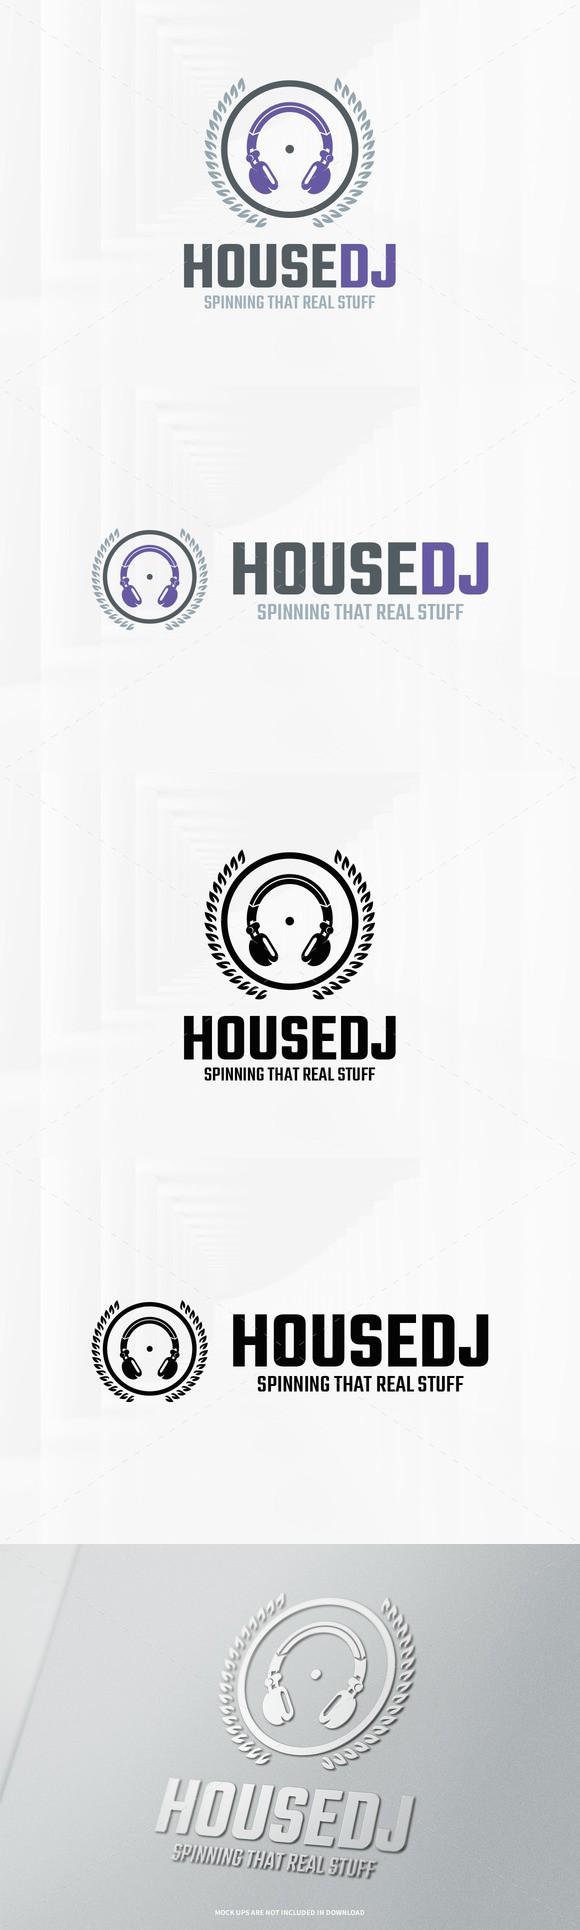 house dj logo template logo templates 29 00 logo templates